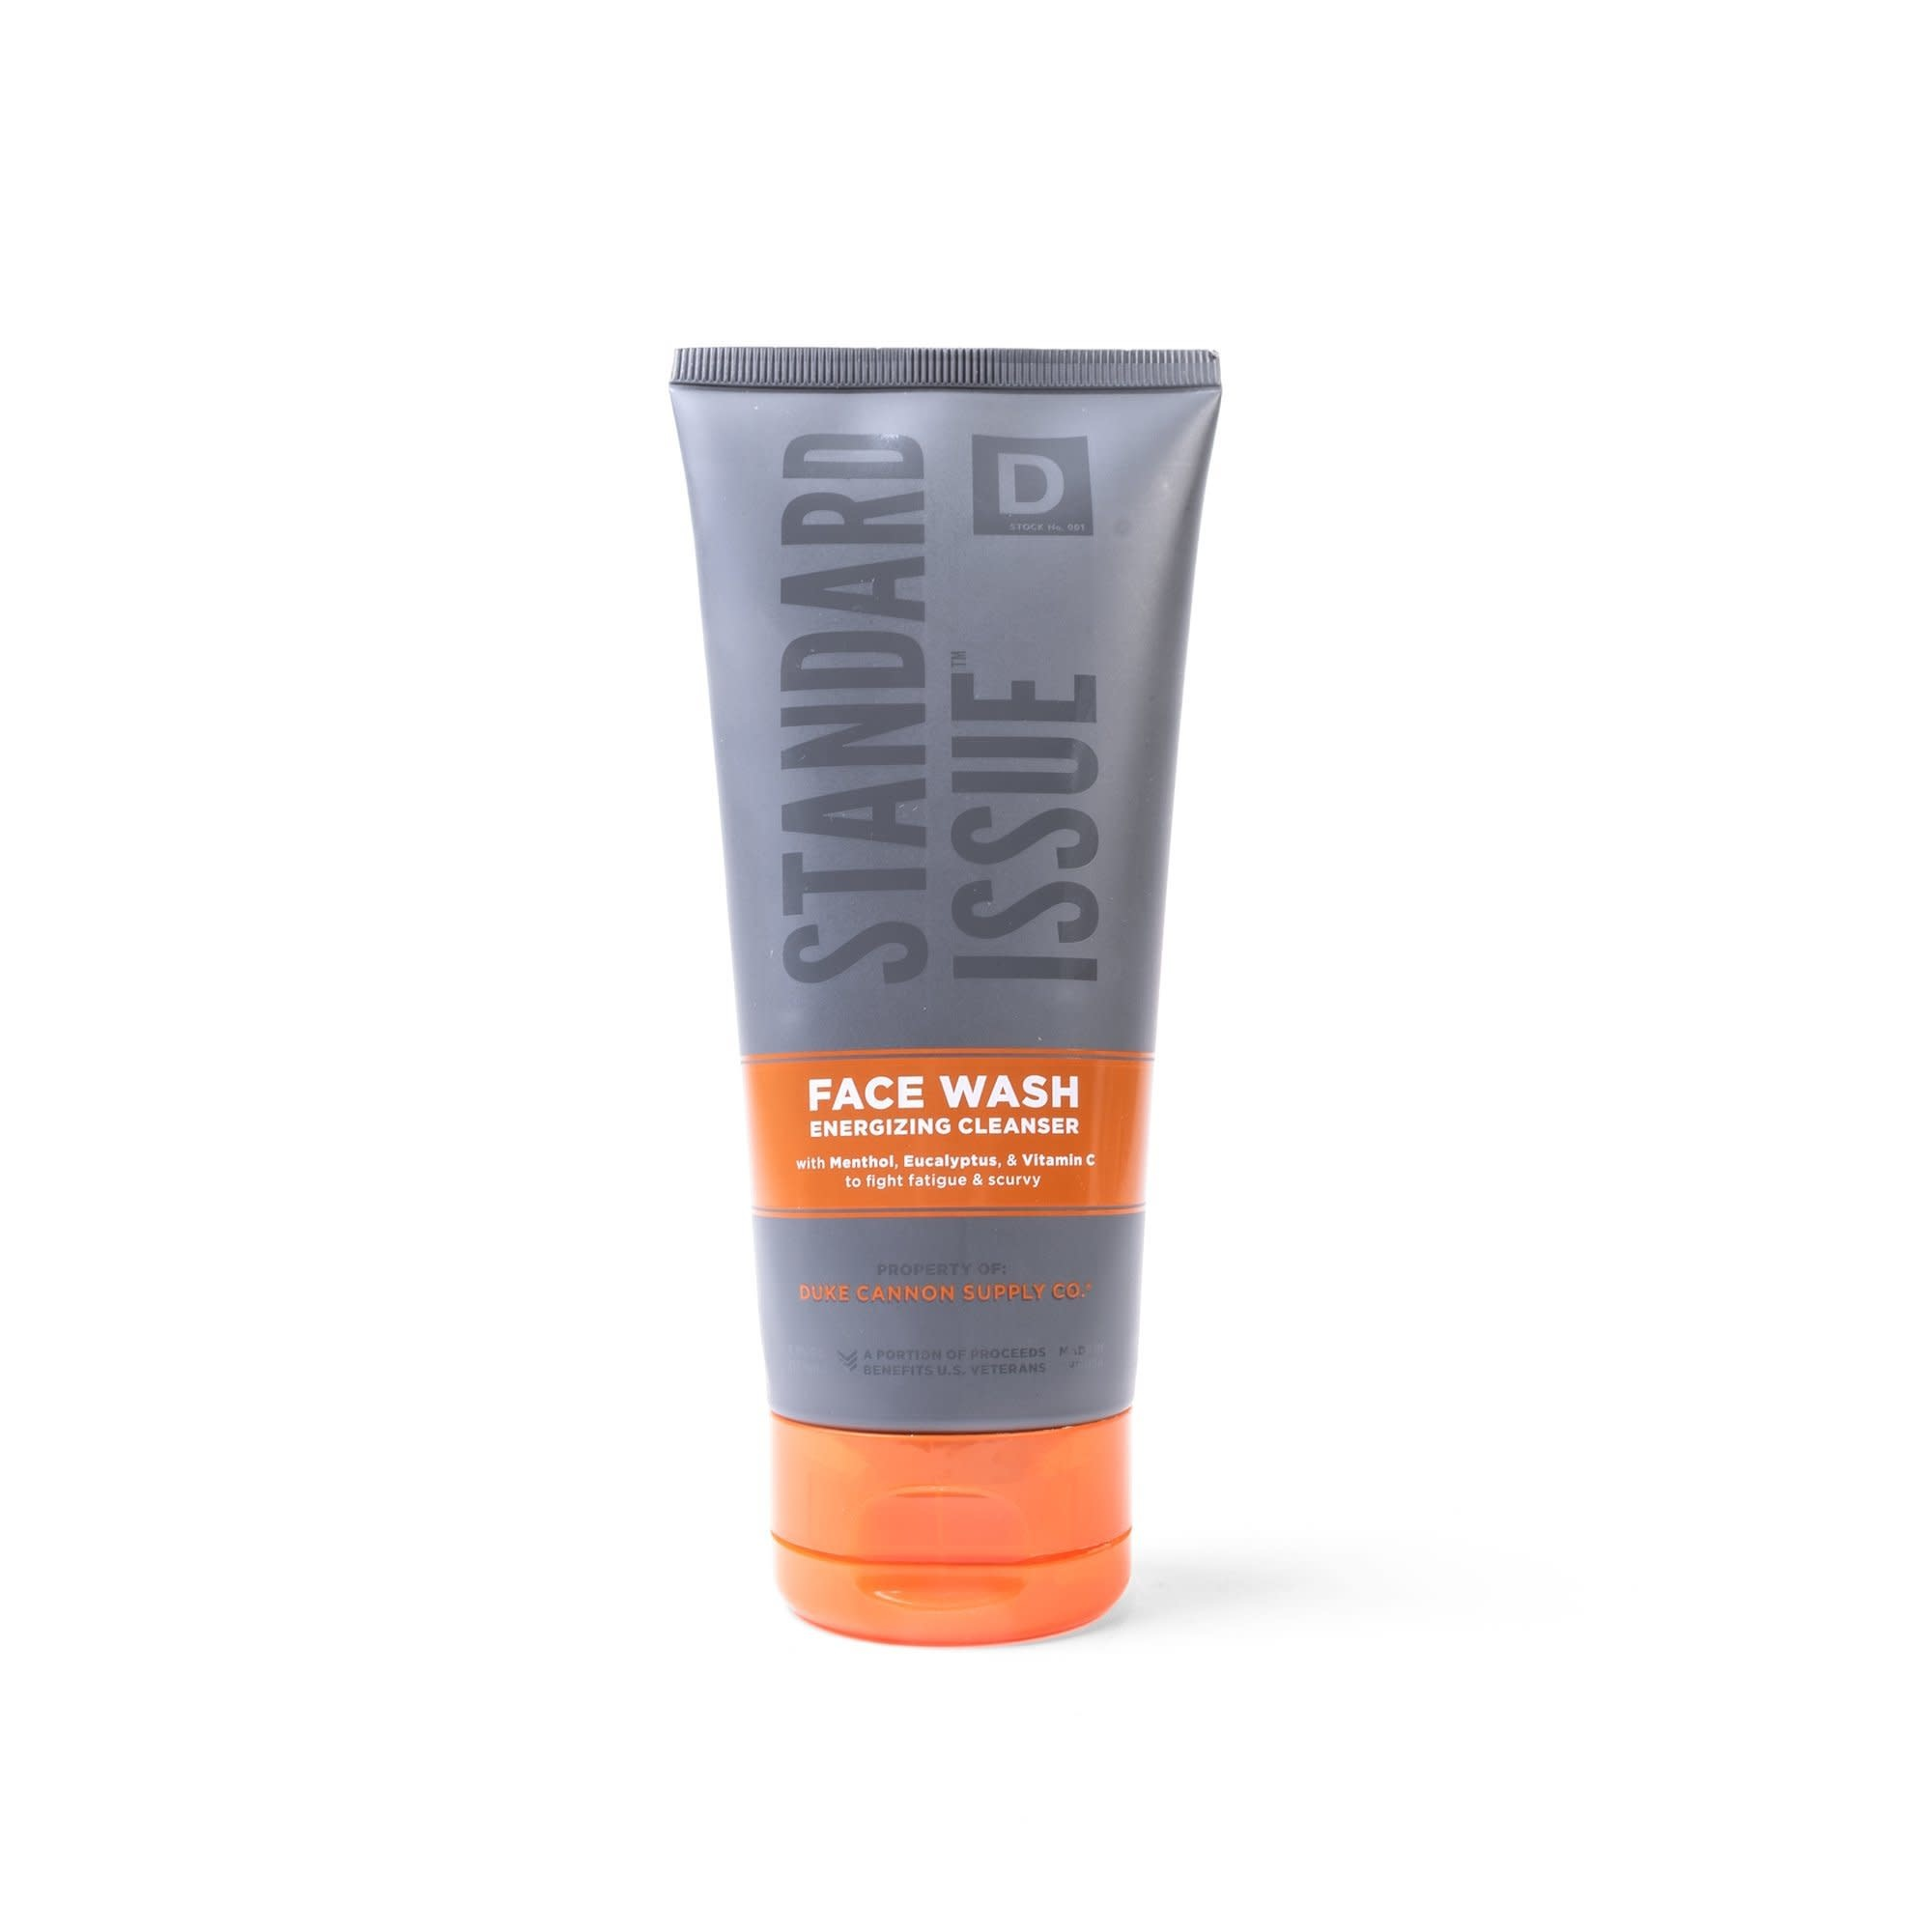 Duke Cannon Standard Issue Energizing Face Wash